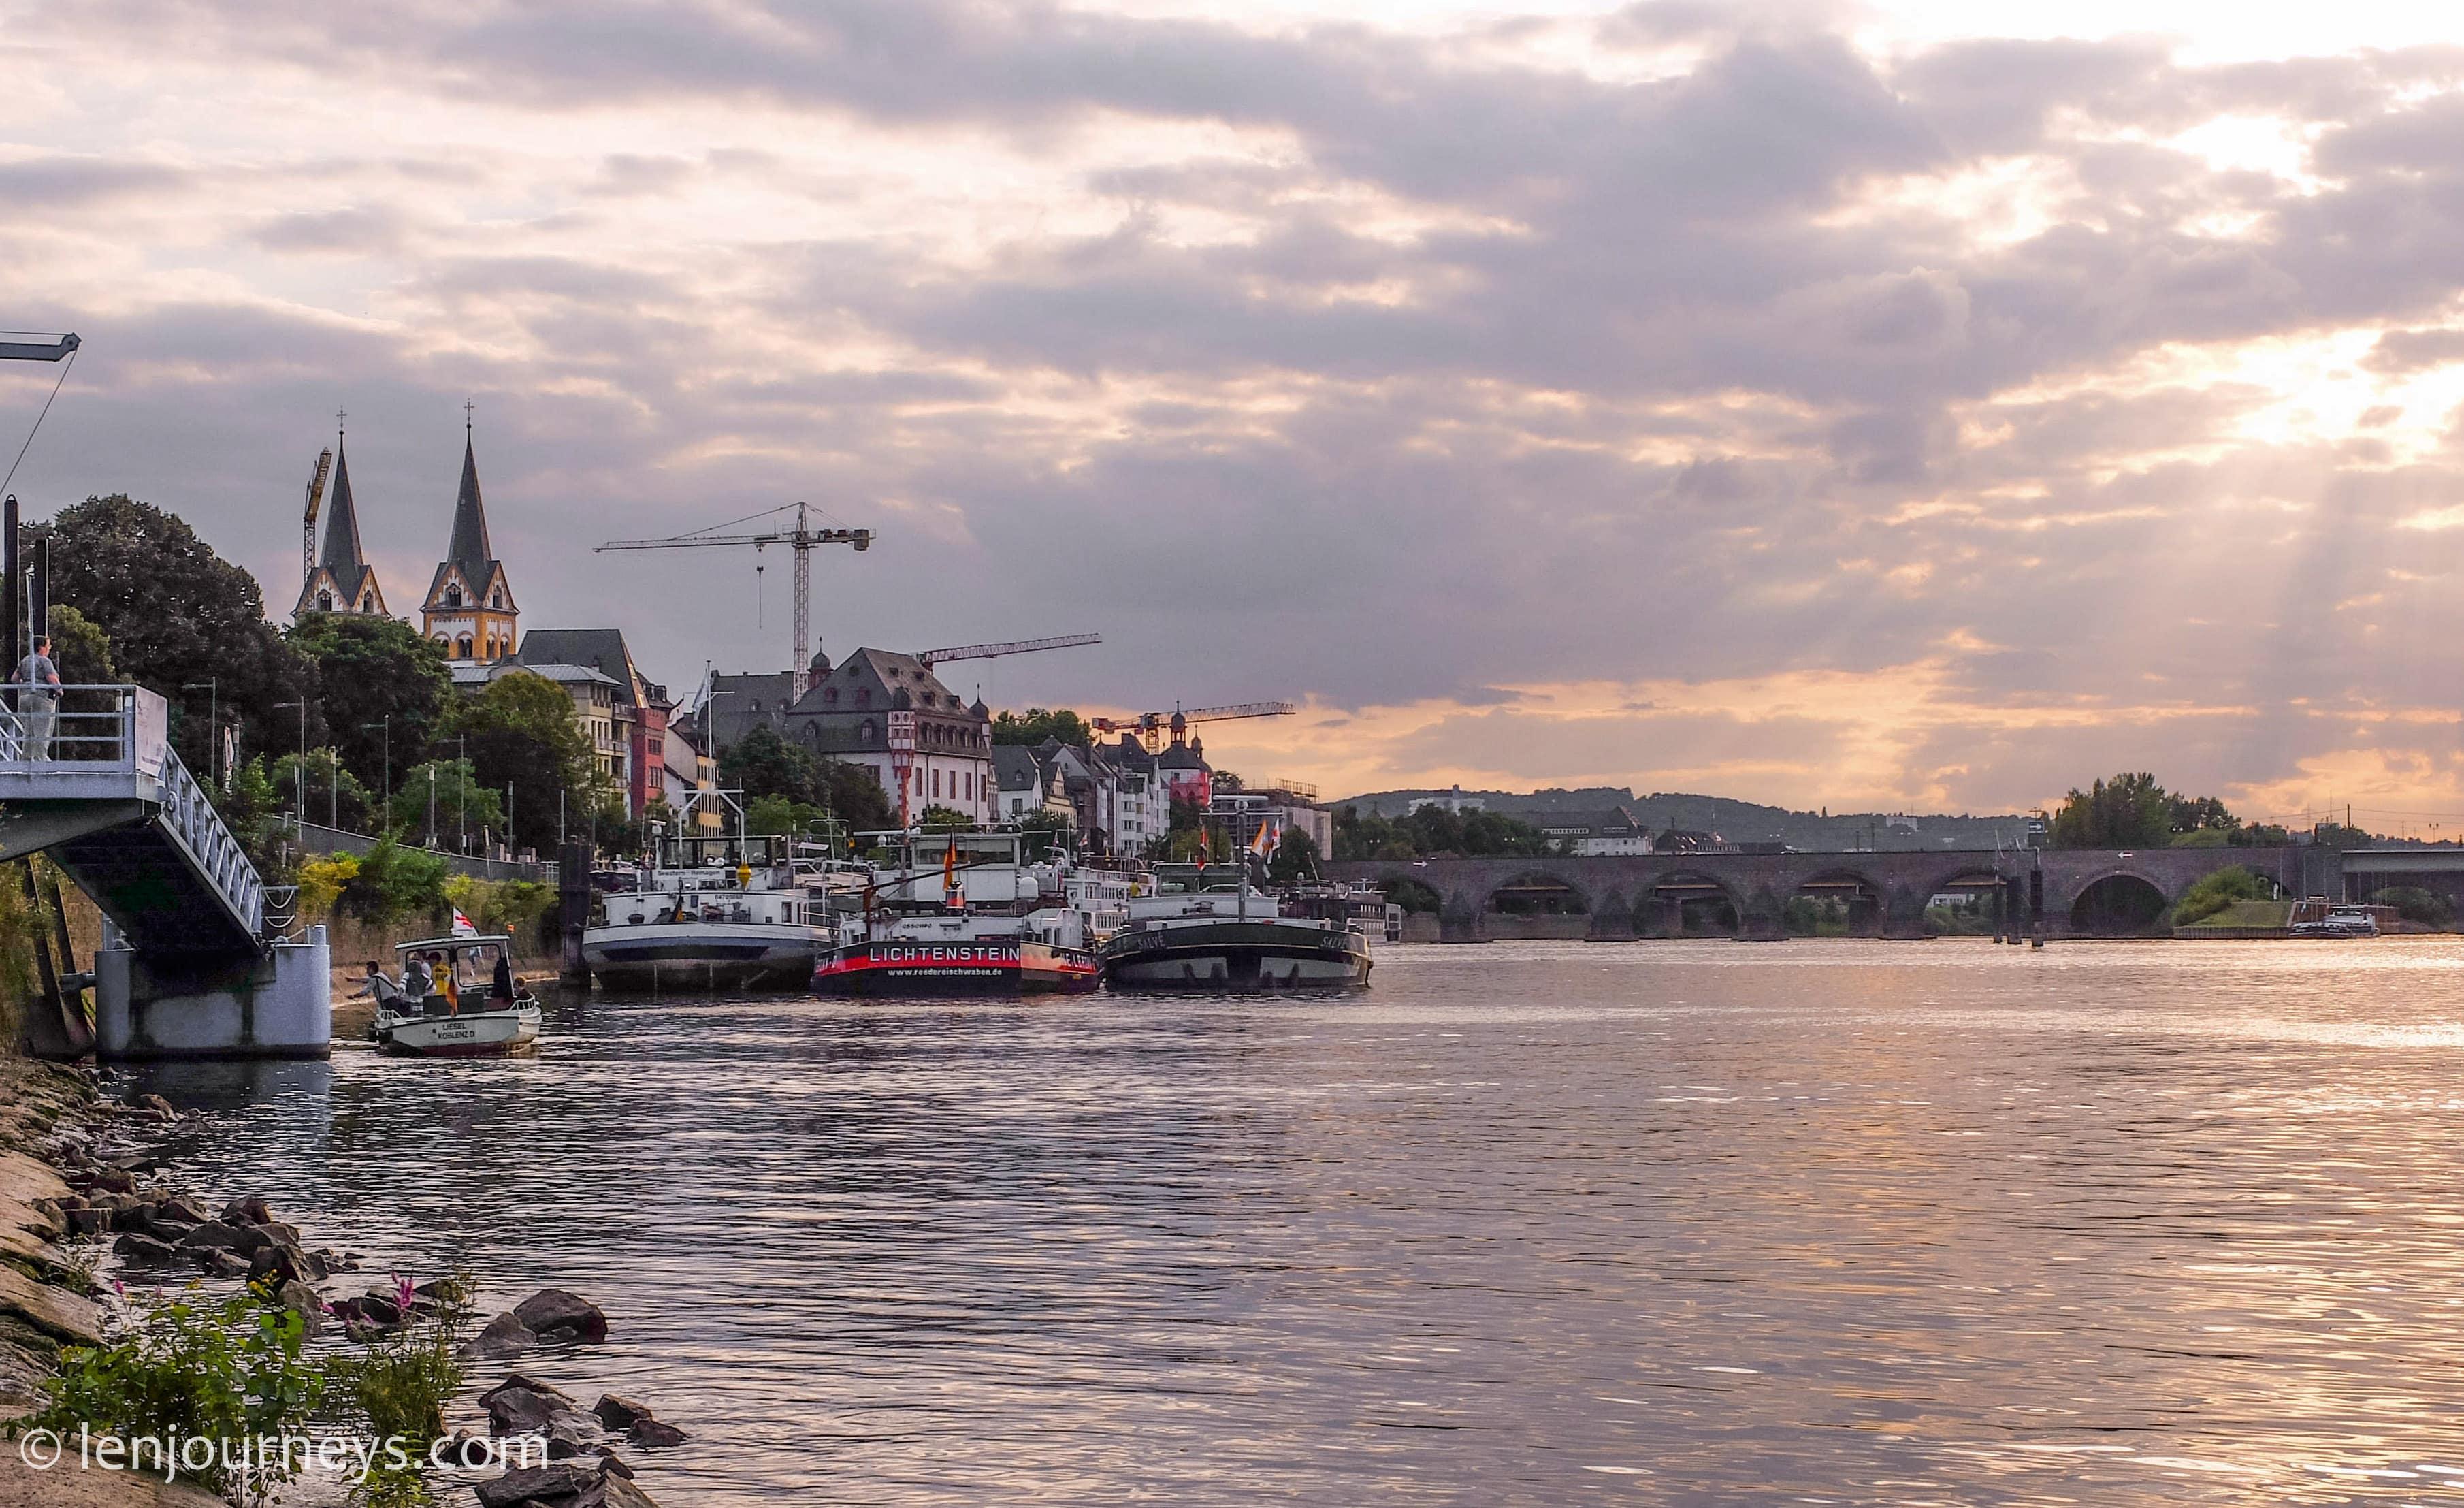 The Moselle running through Koblenz